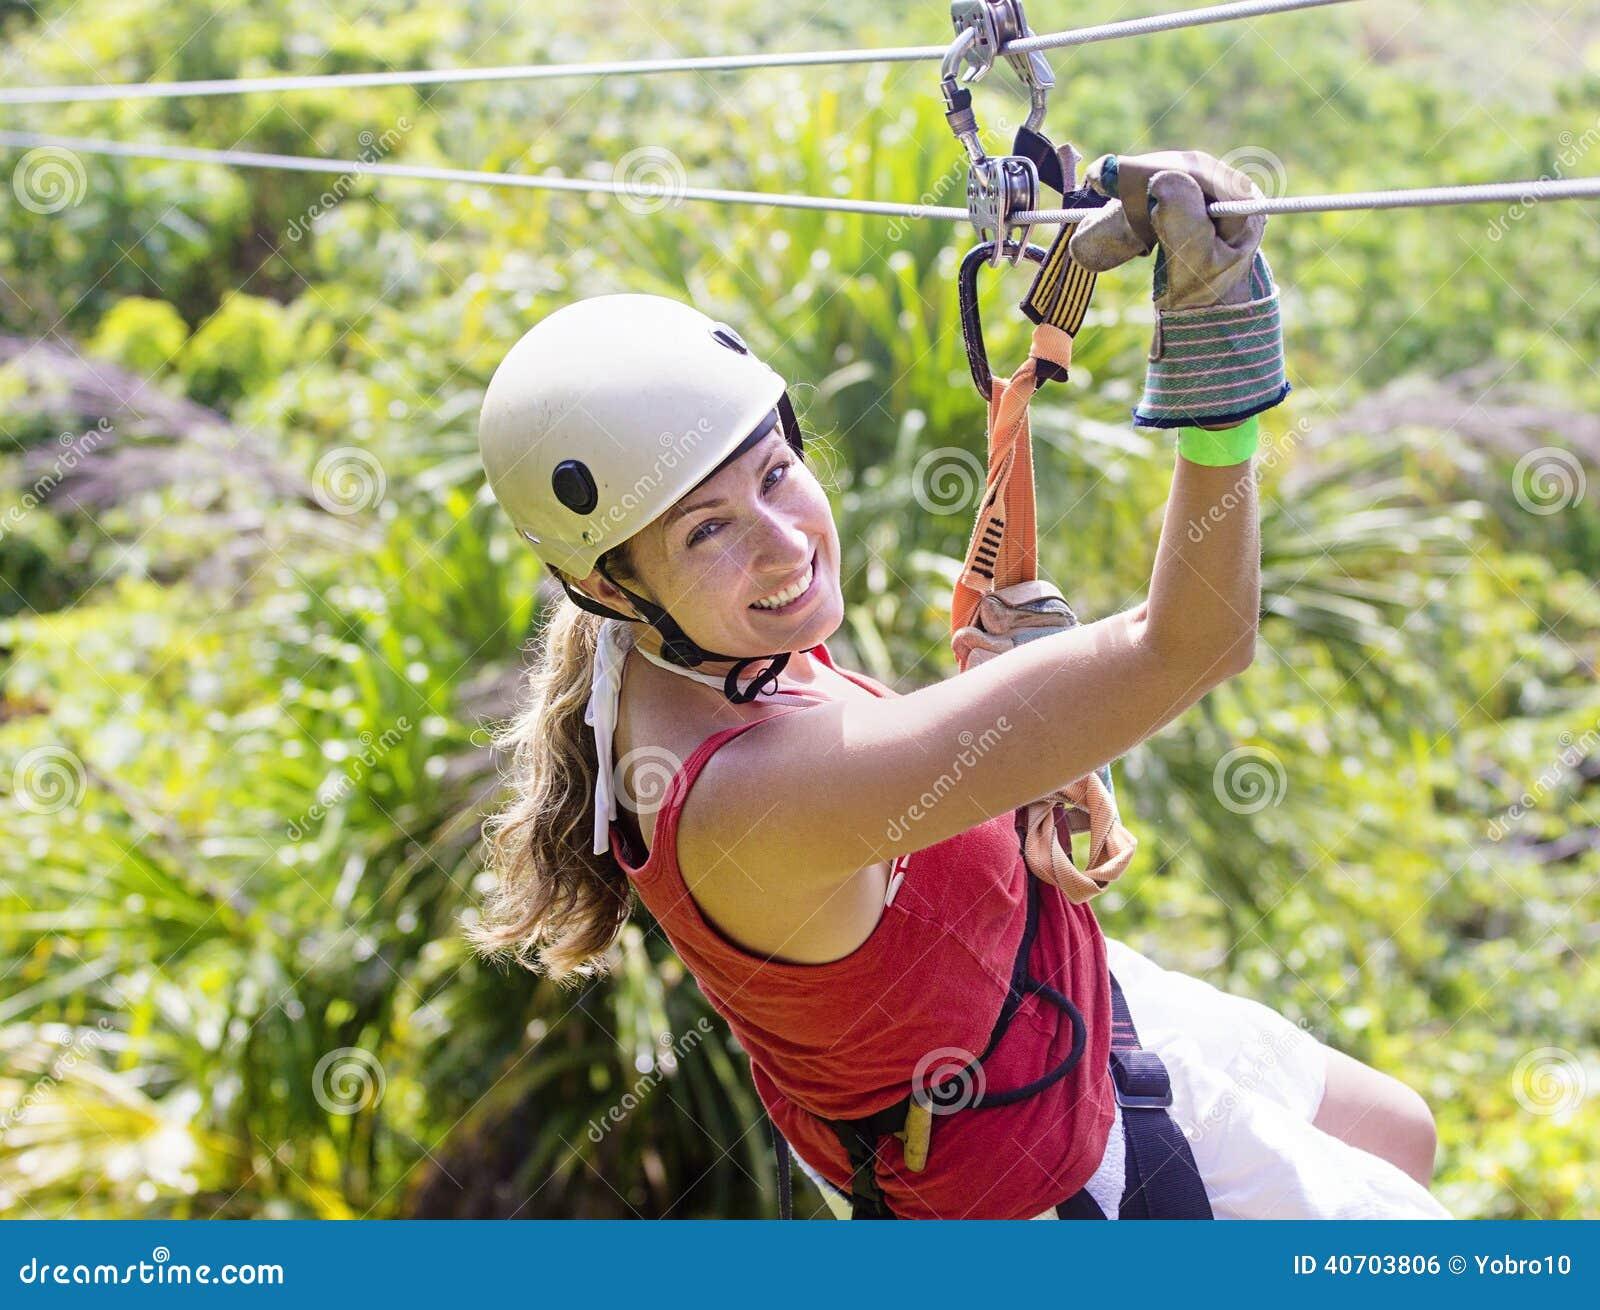 Woman Going On A Jungle Zipline Adventure Stock Photo